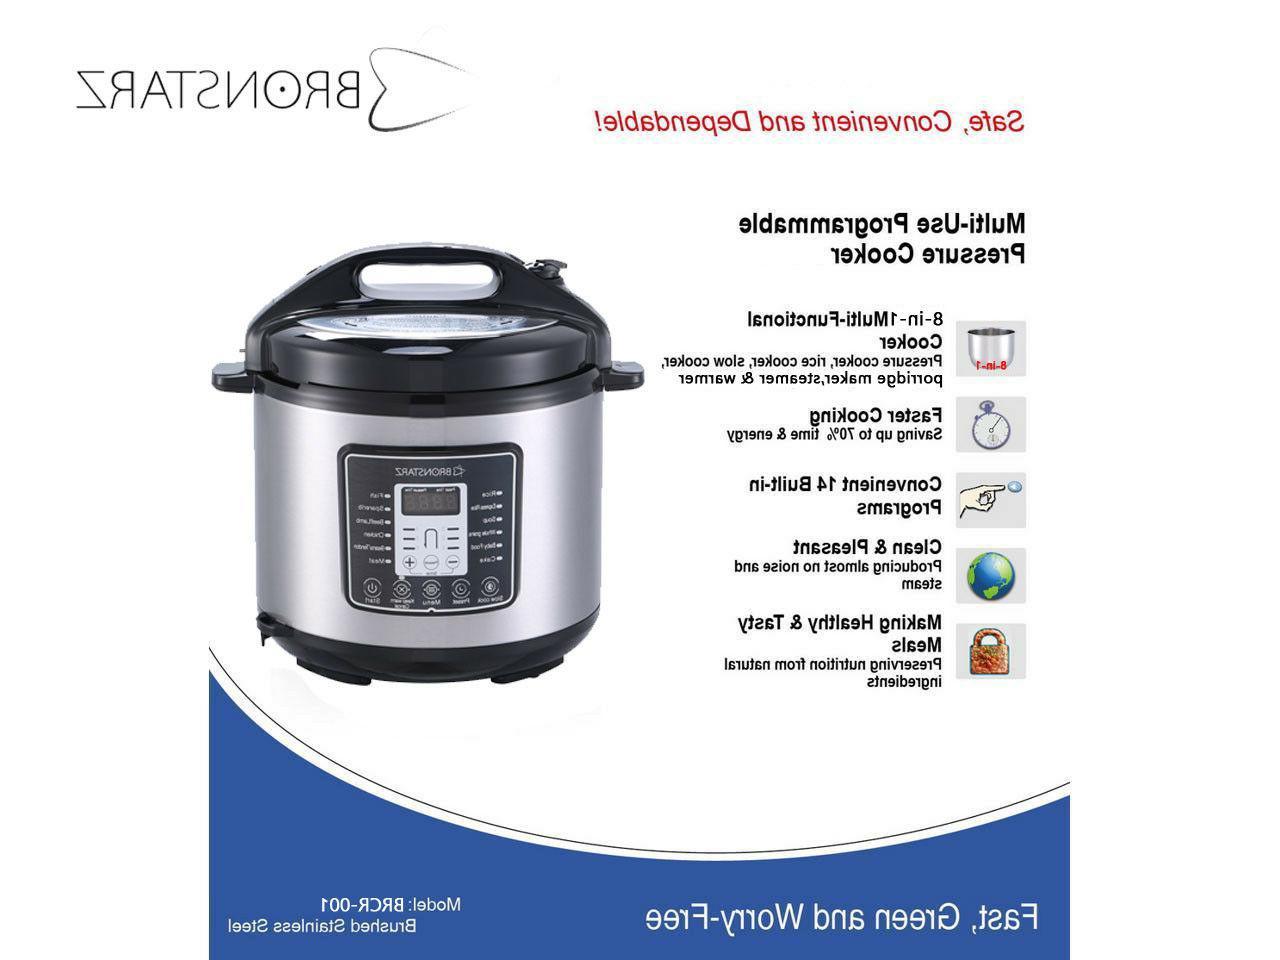 6 8-in-1 Pressure Cooker instant Slow